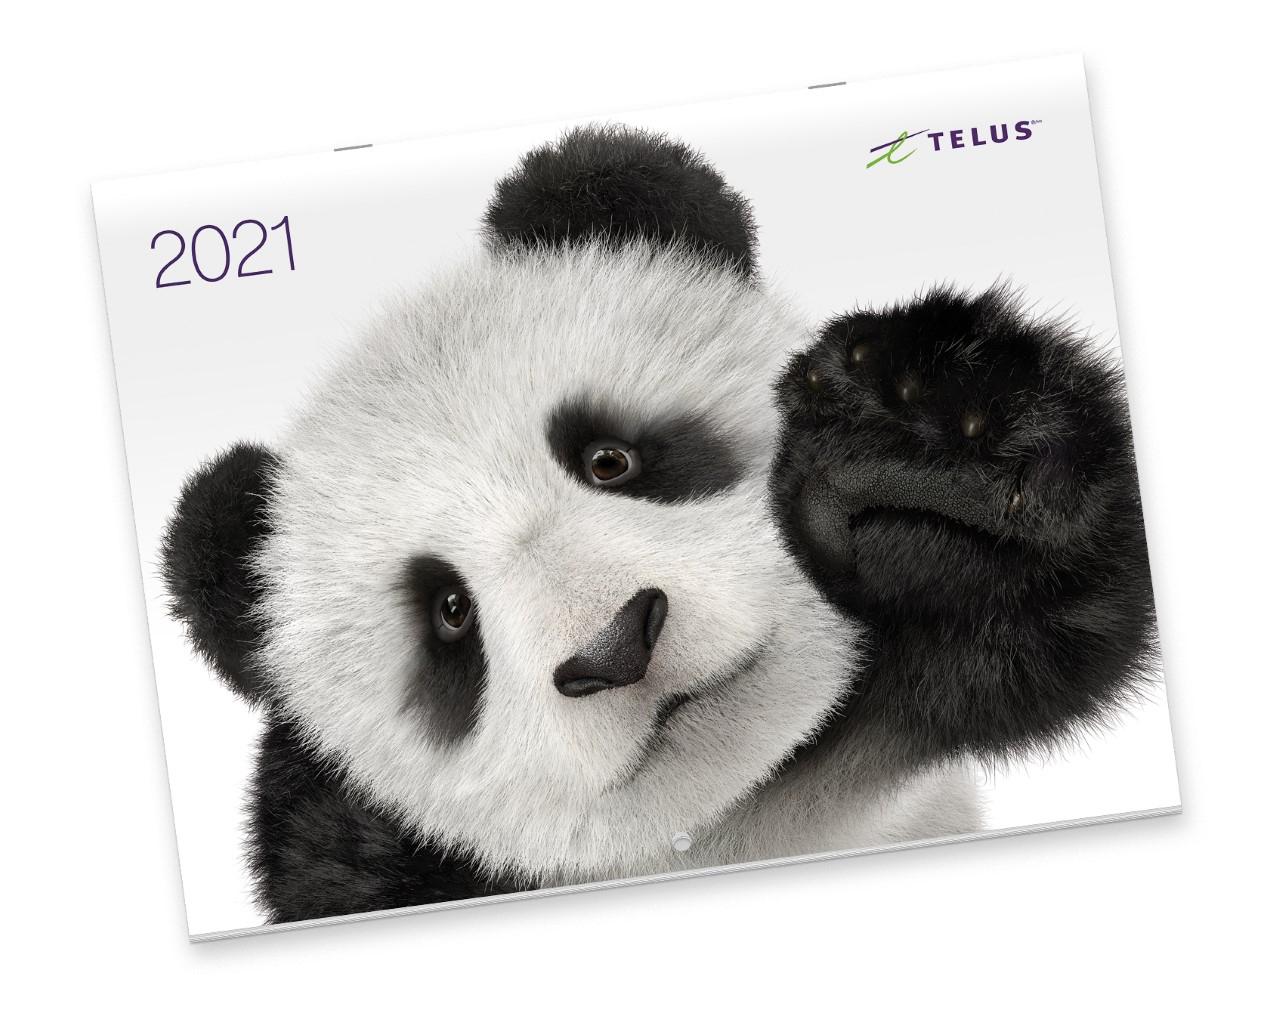 The 2021 Telus Calendar Is Back.